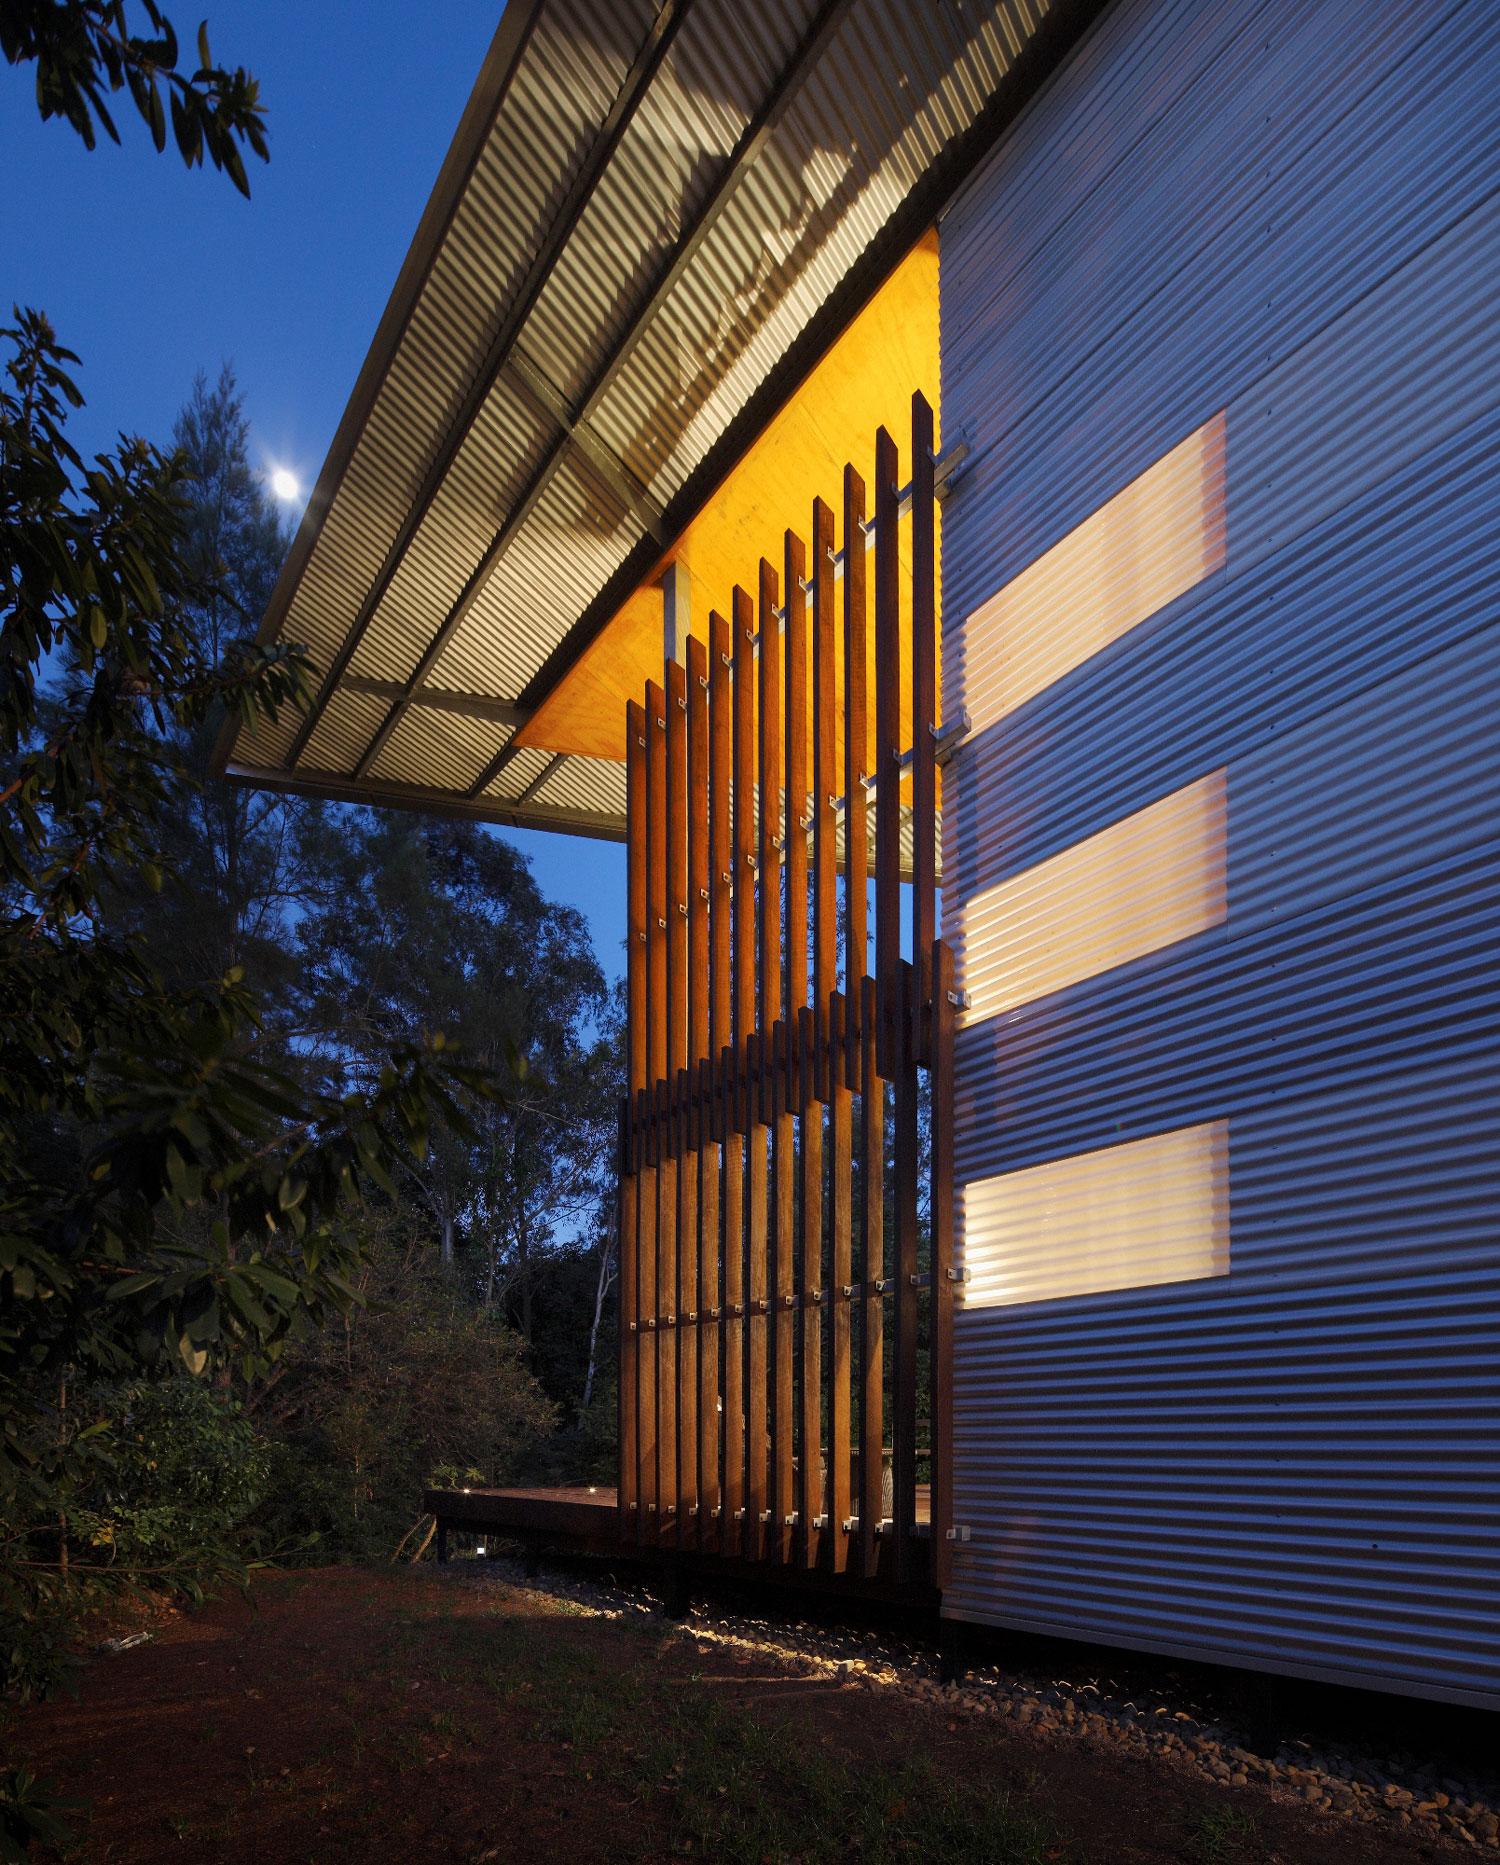 The-Gap-Residence-Guymer-Bailey-Architects-04.jpg